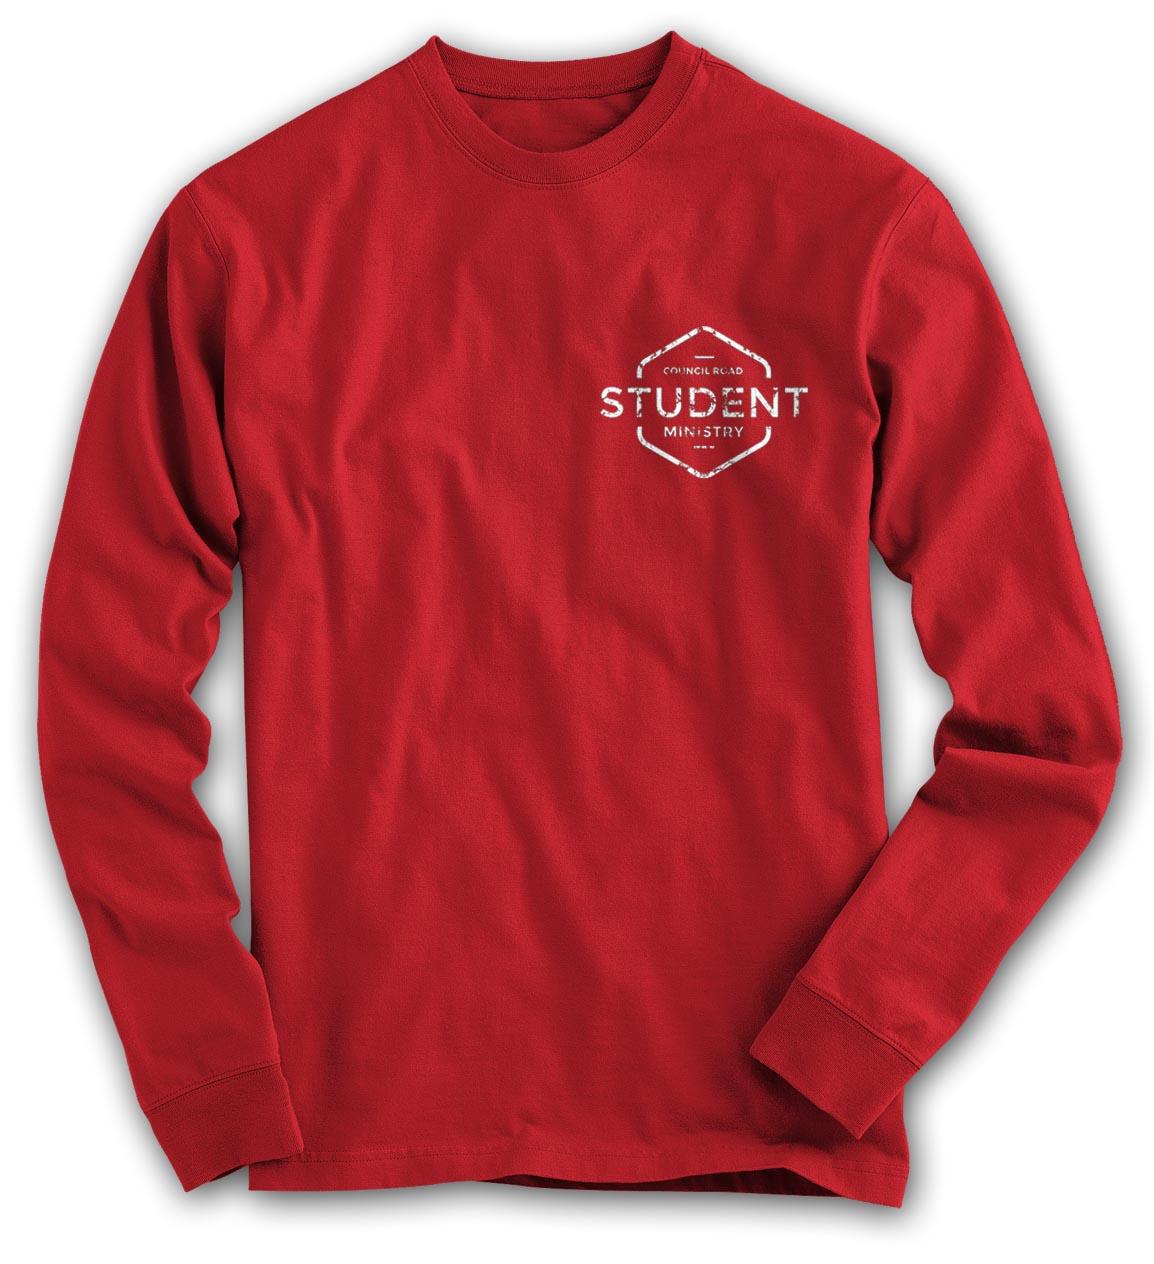 Studetn Ministry Sweatshirt